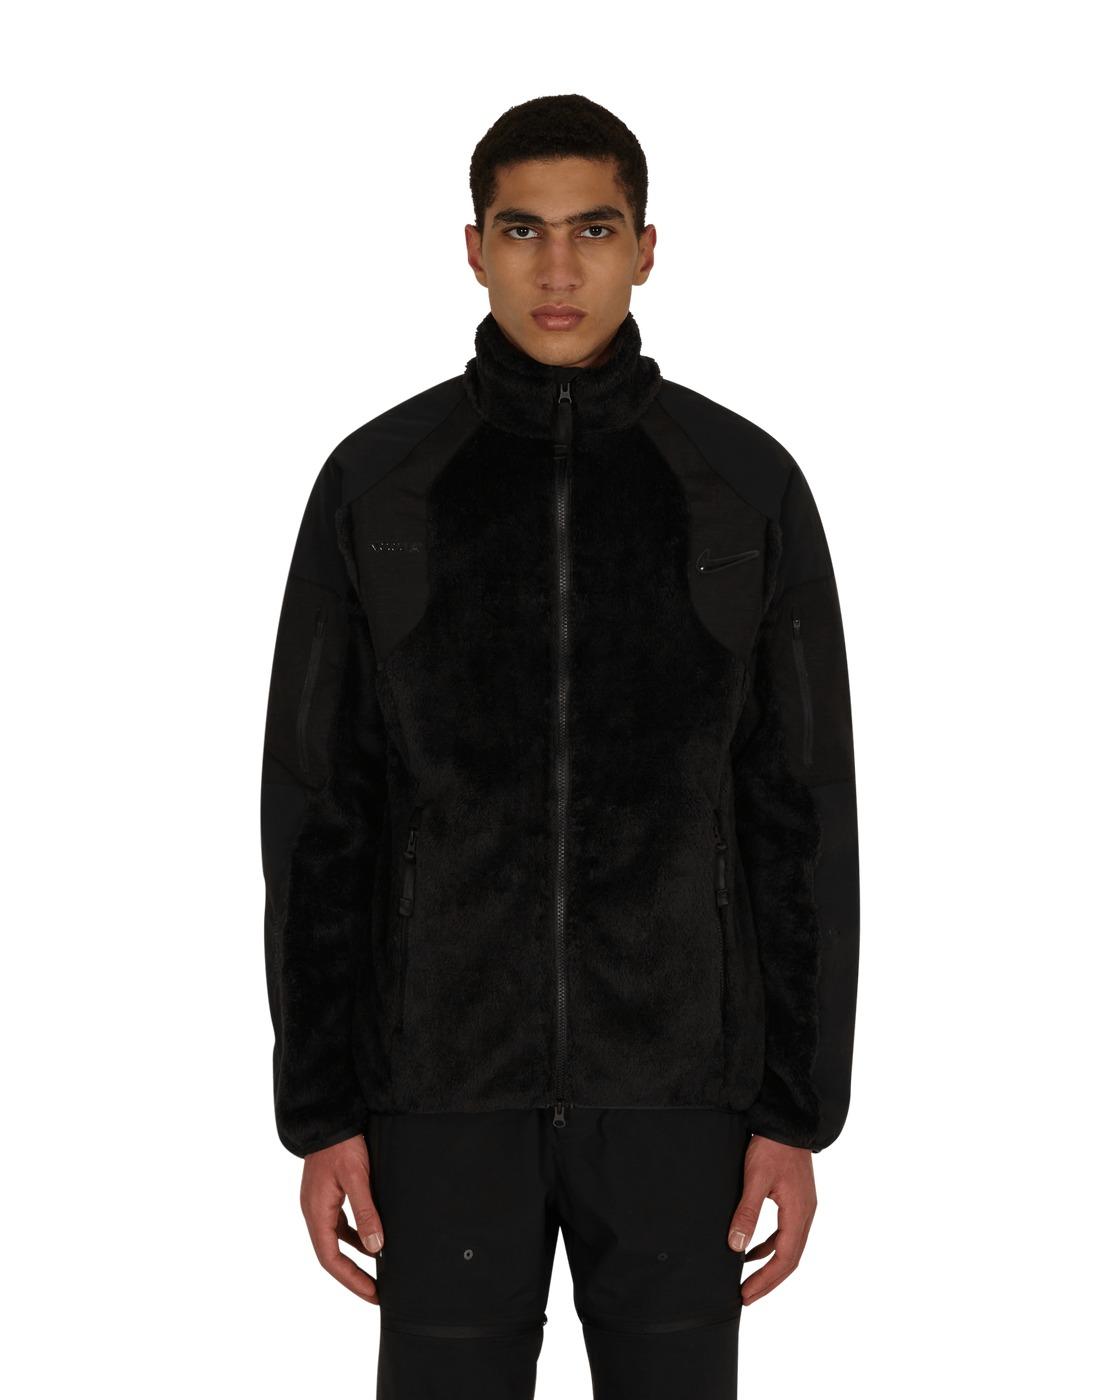 Photo: Nike Special Project Nocta Polar Fleece Jacket Black/Black